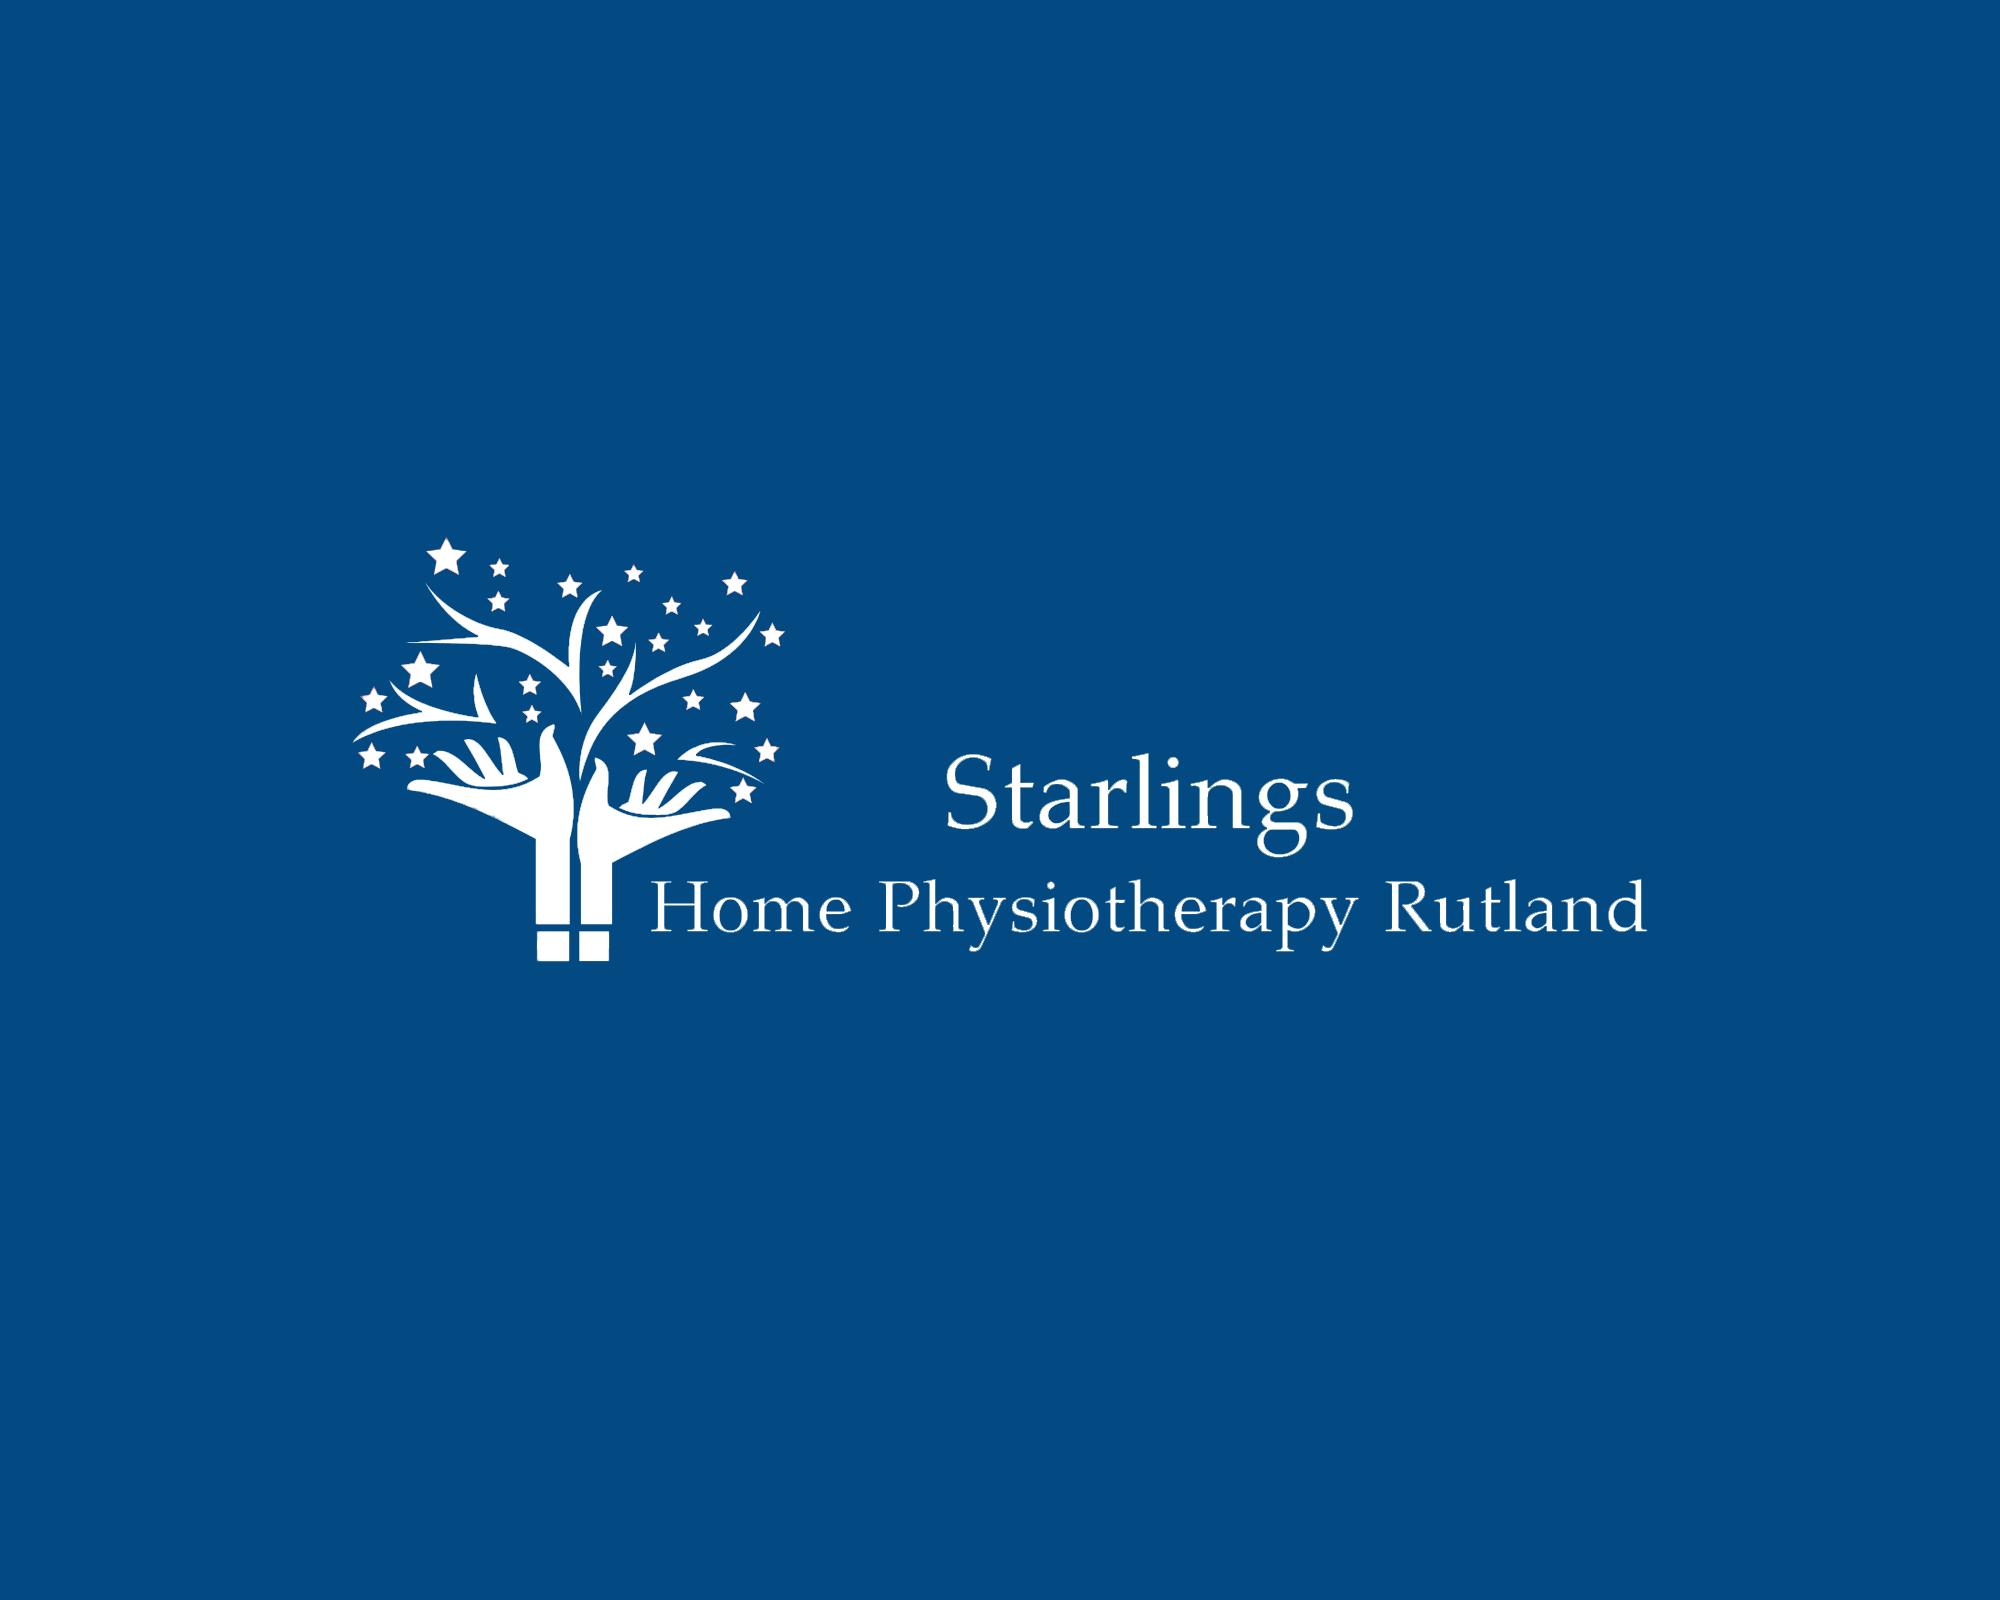 starlings home physiotherapy rutland Logo